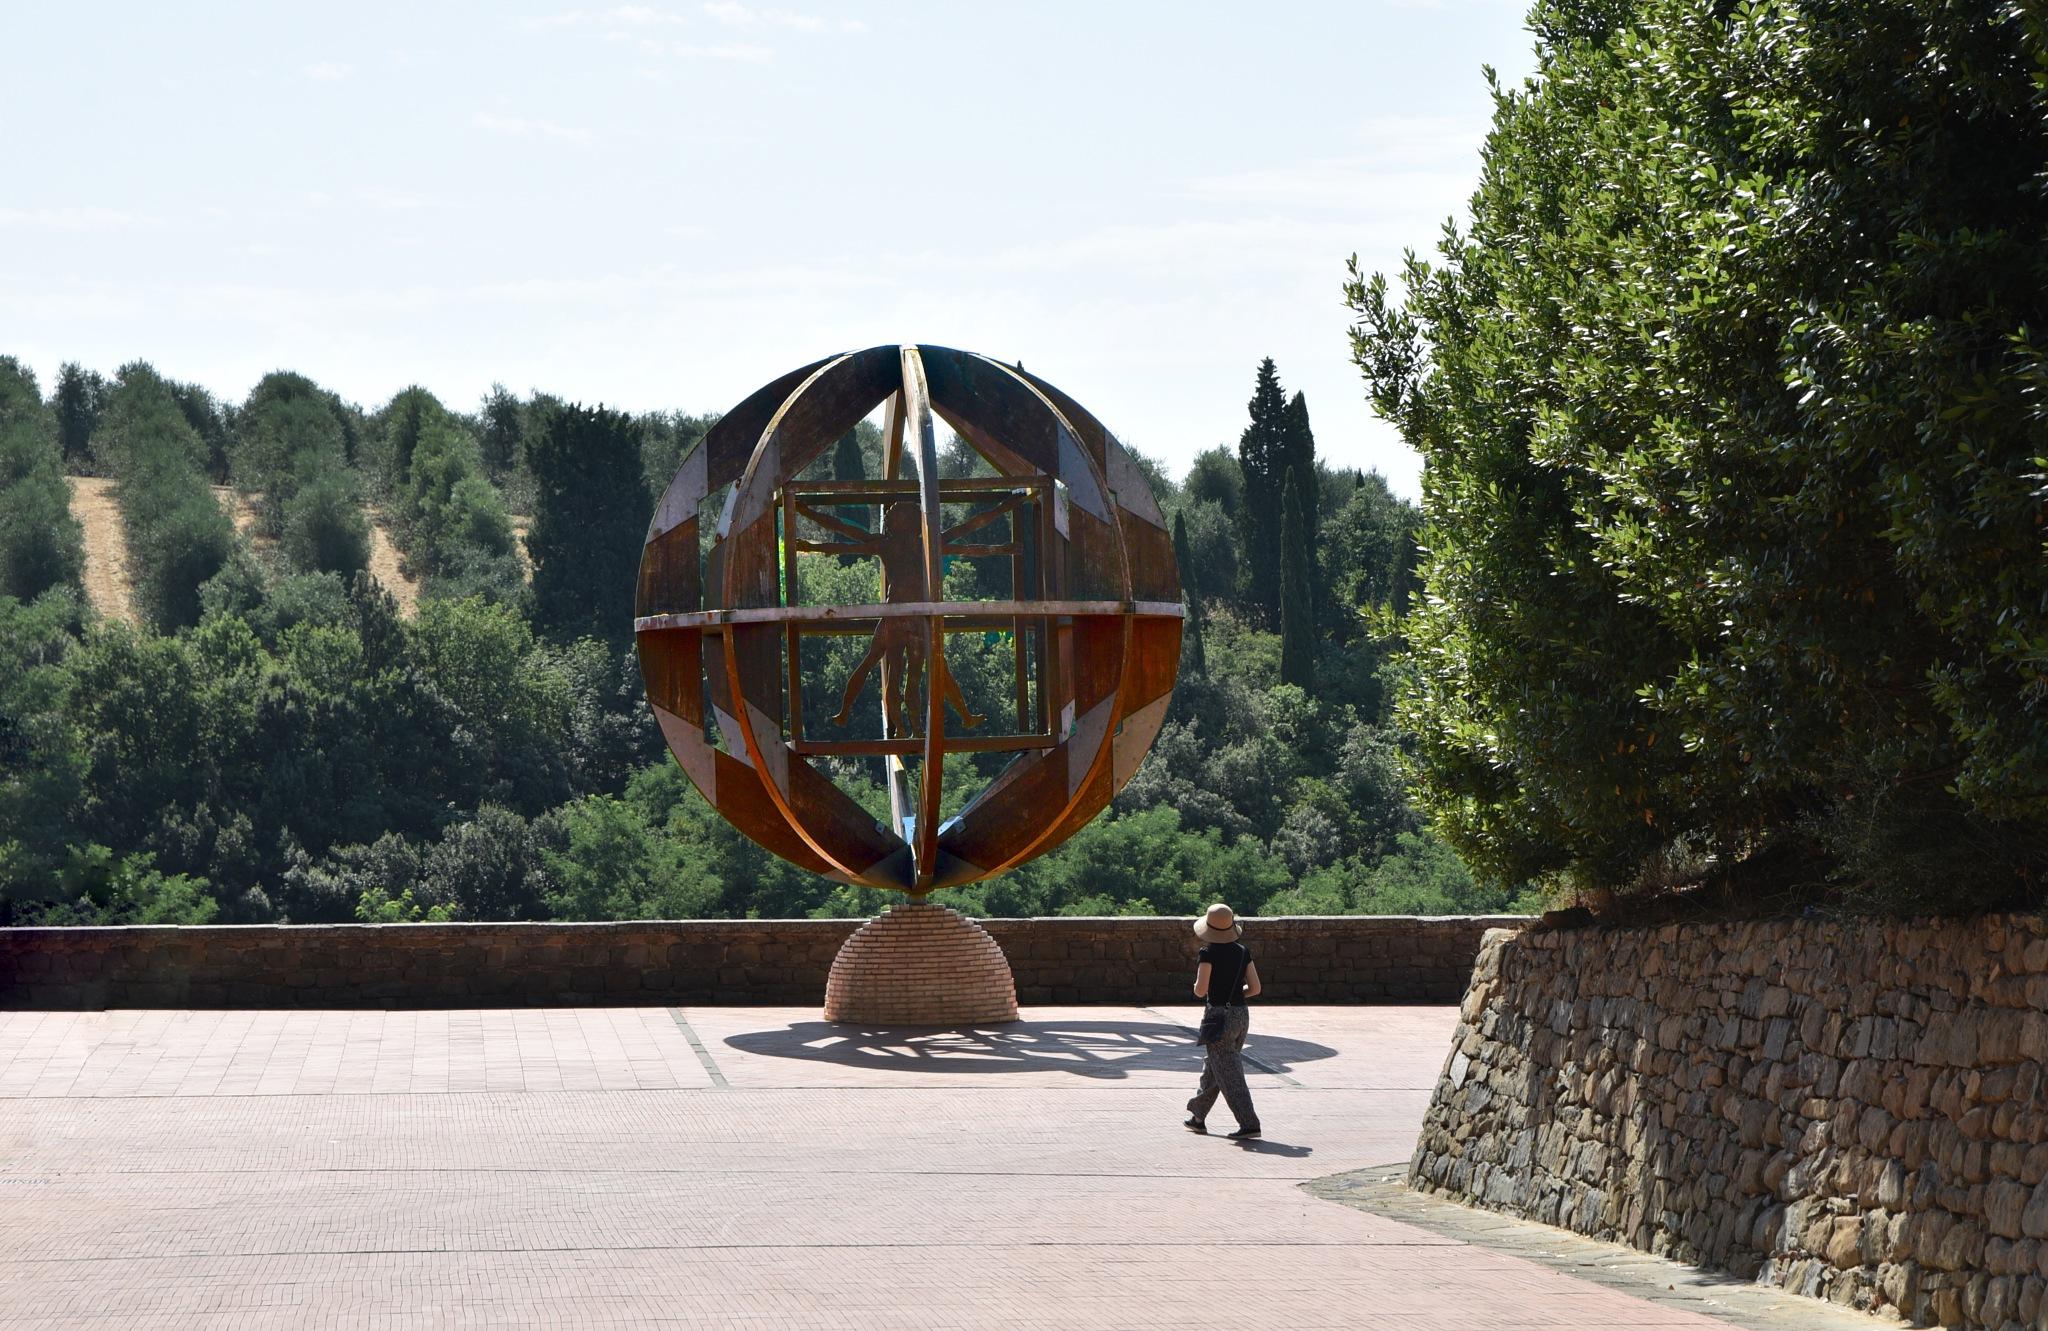 Vinci by Moshe Harosh